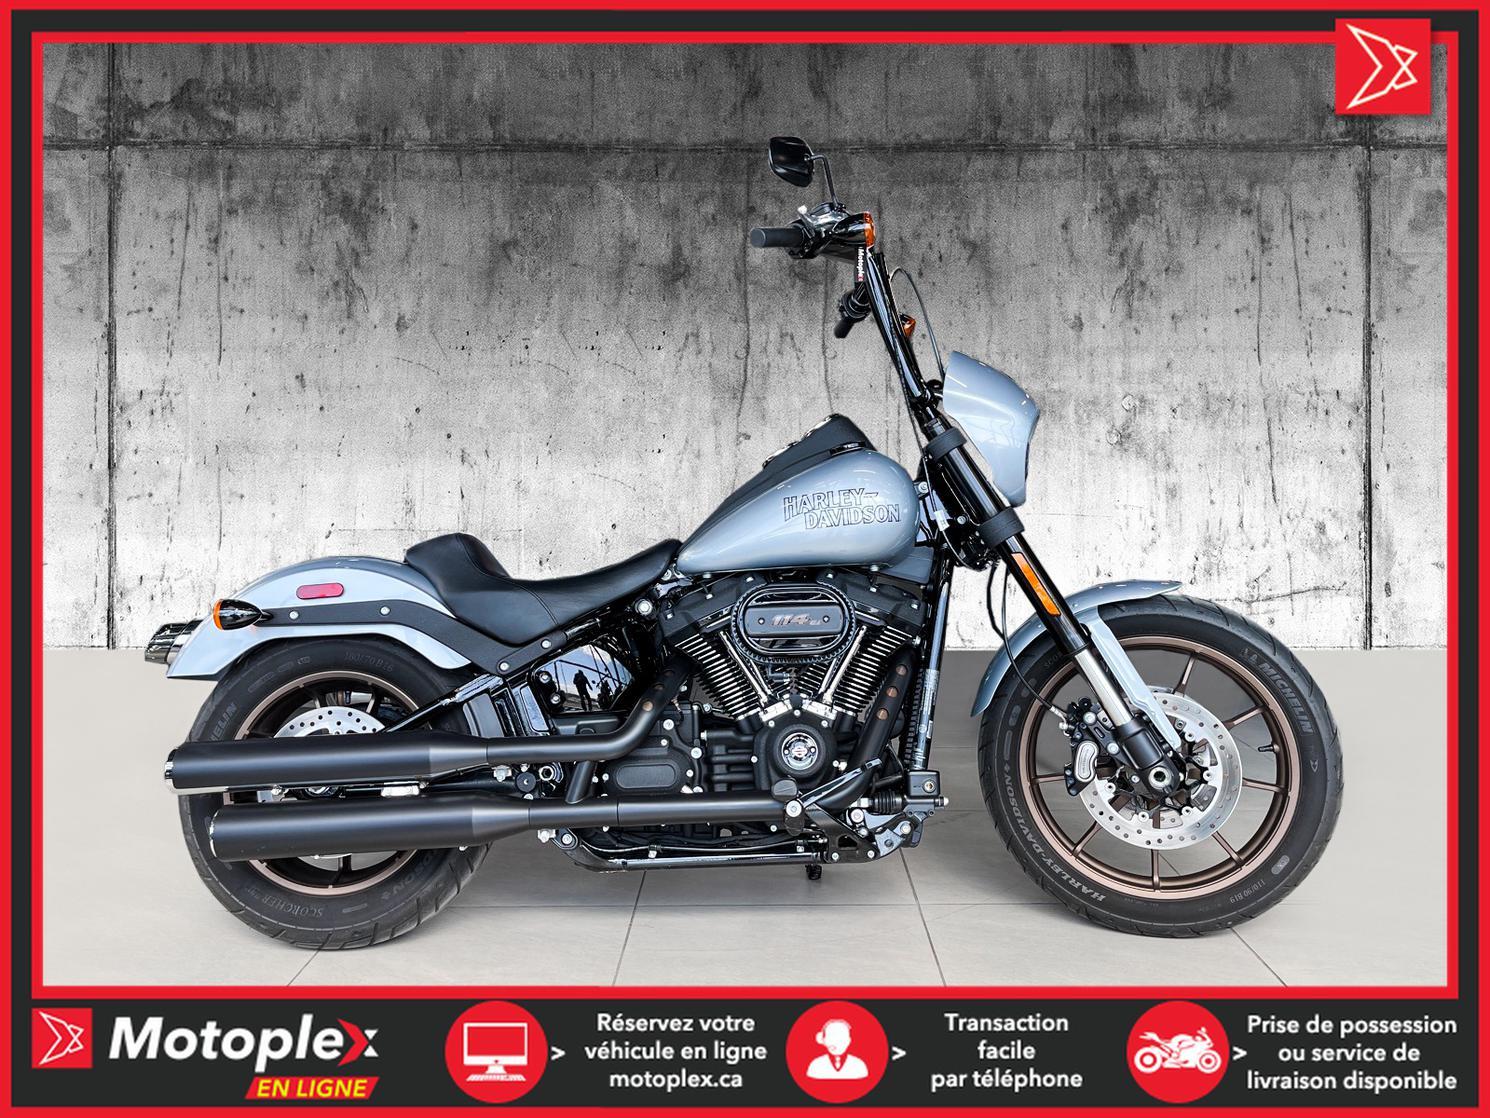 2020 Harley-Davidson LOW RIDER FXLRS 114 - 67$/SEMAINE